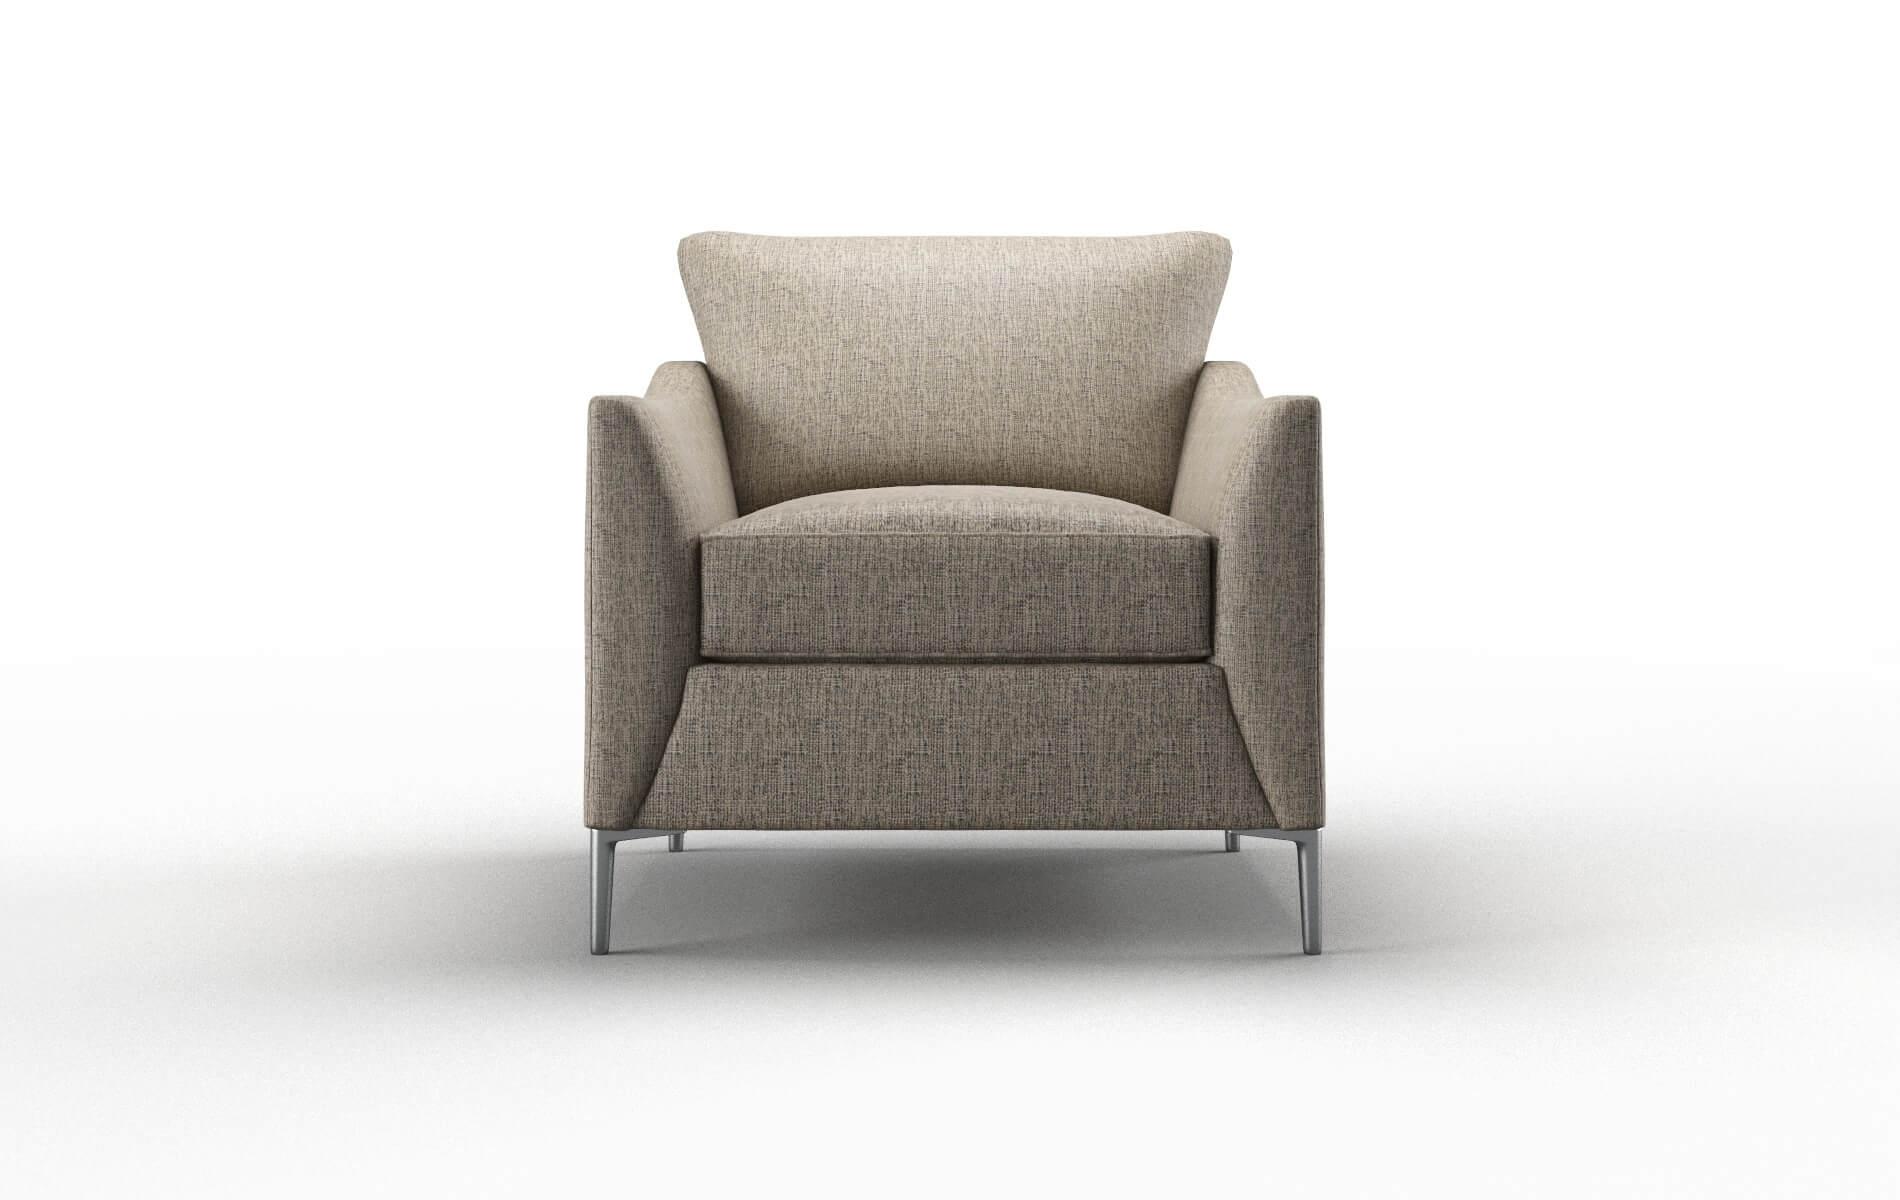 Hamburg Solifestyle 51 Chair metal legs 1